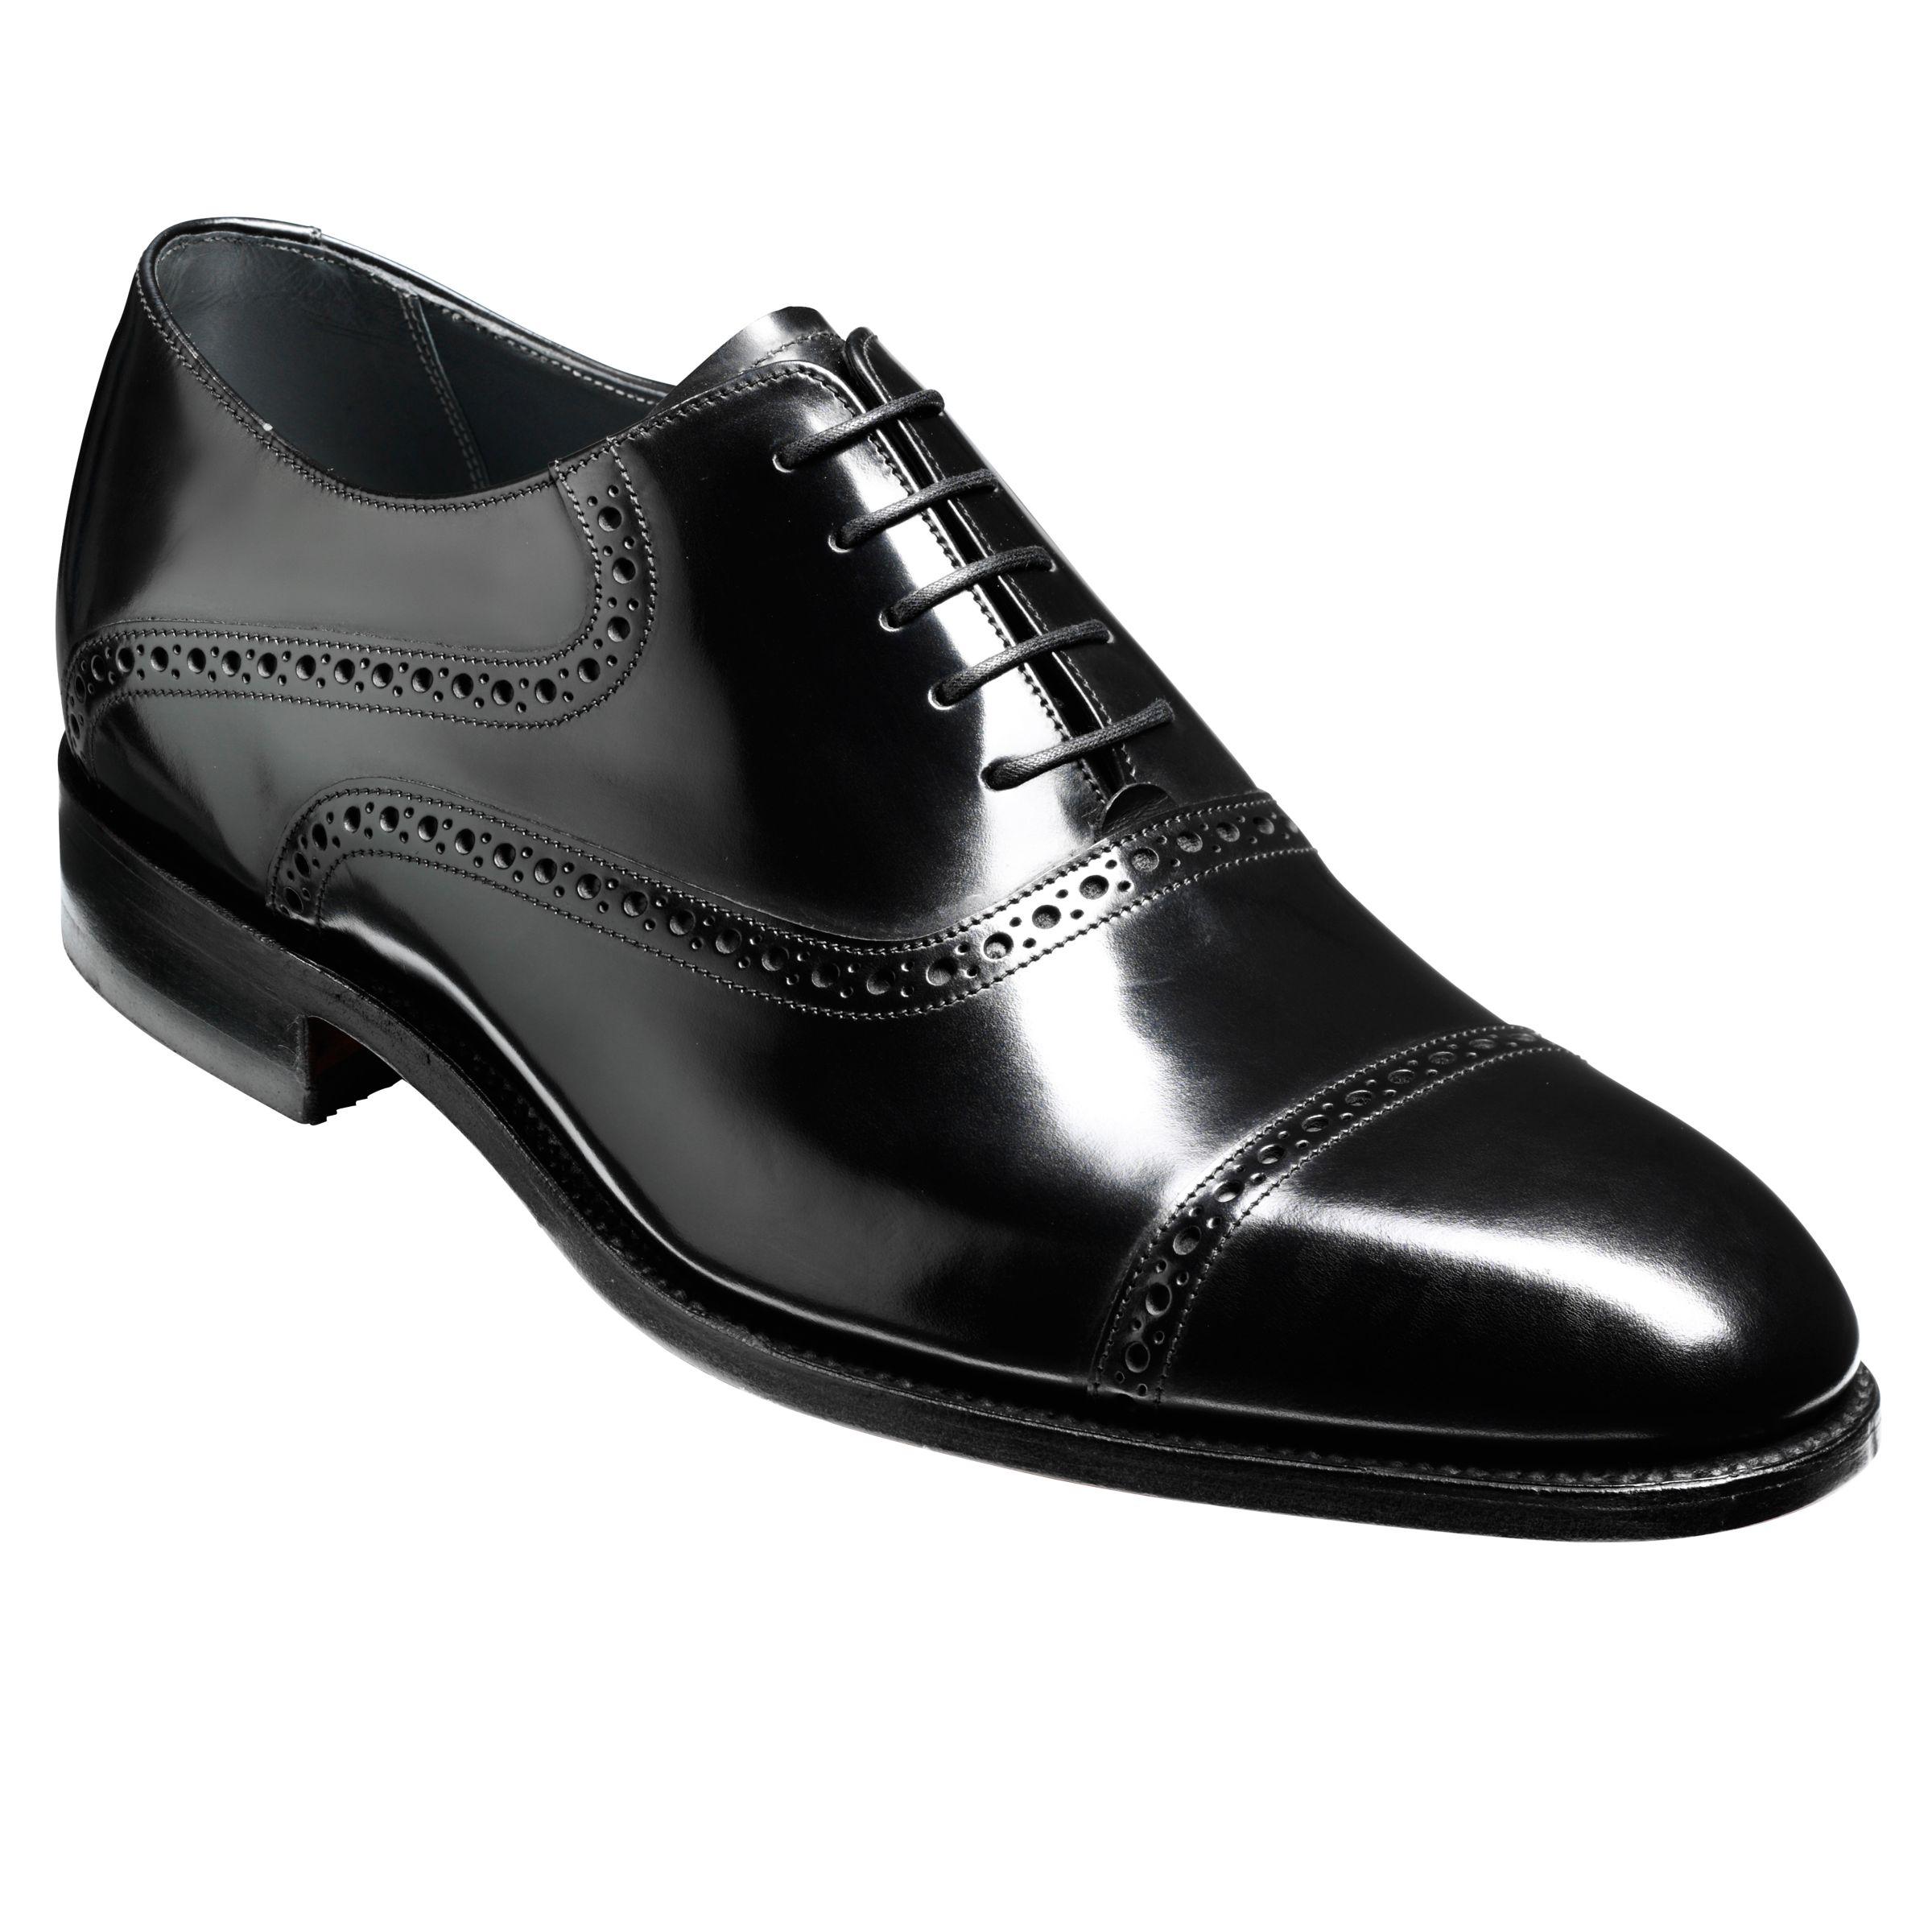 Barker Barker Wilton Goodyear Welt Leather Oxford Shoes, Black